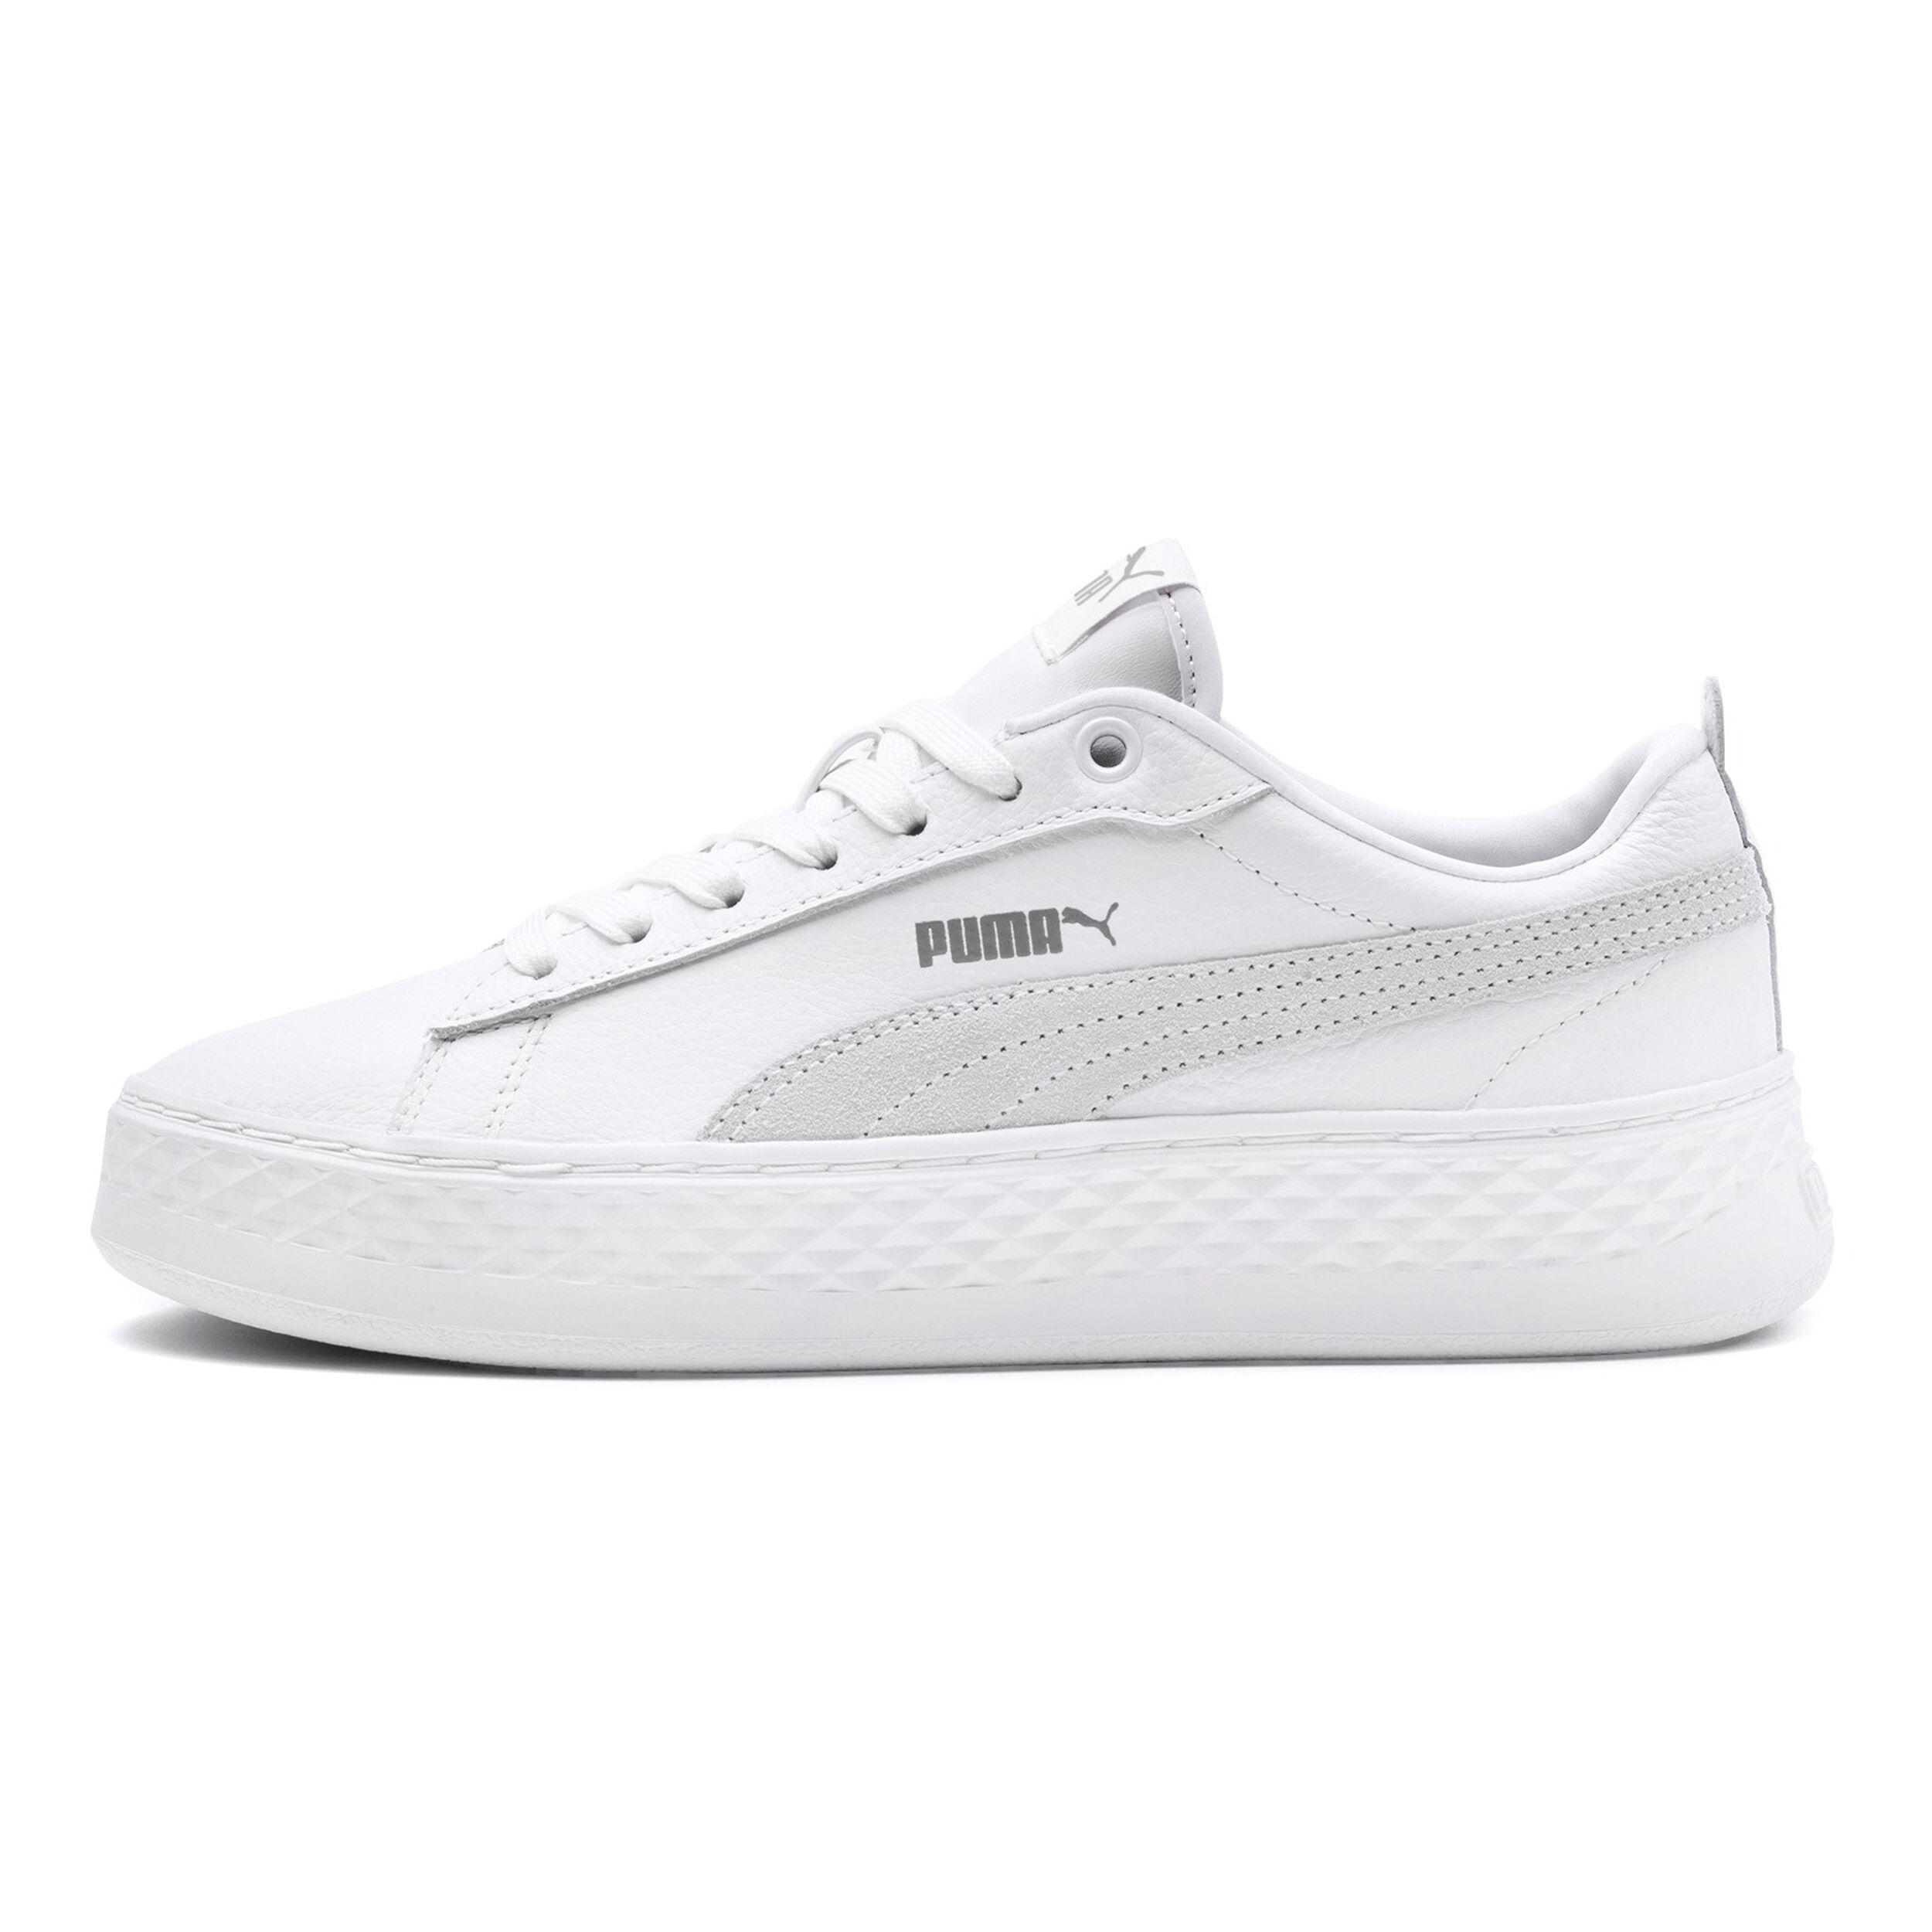 Puma Platform | Schuhe Online Outlet Warenhaus | TresOriginal